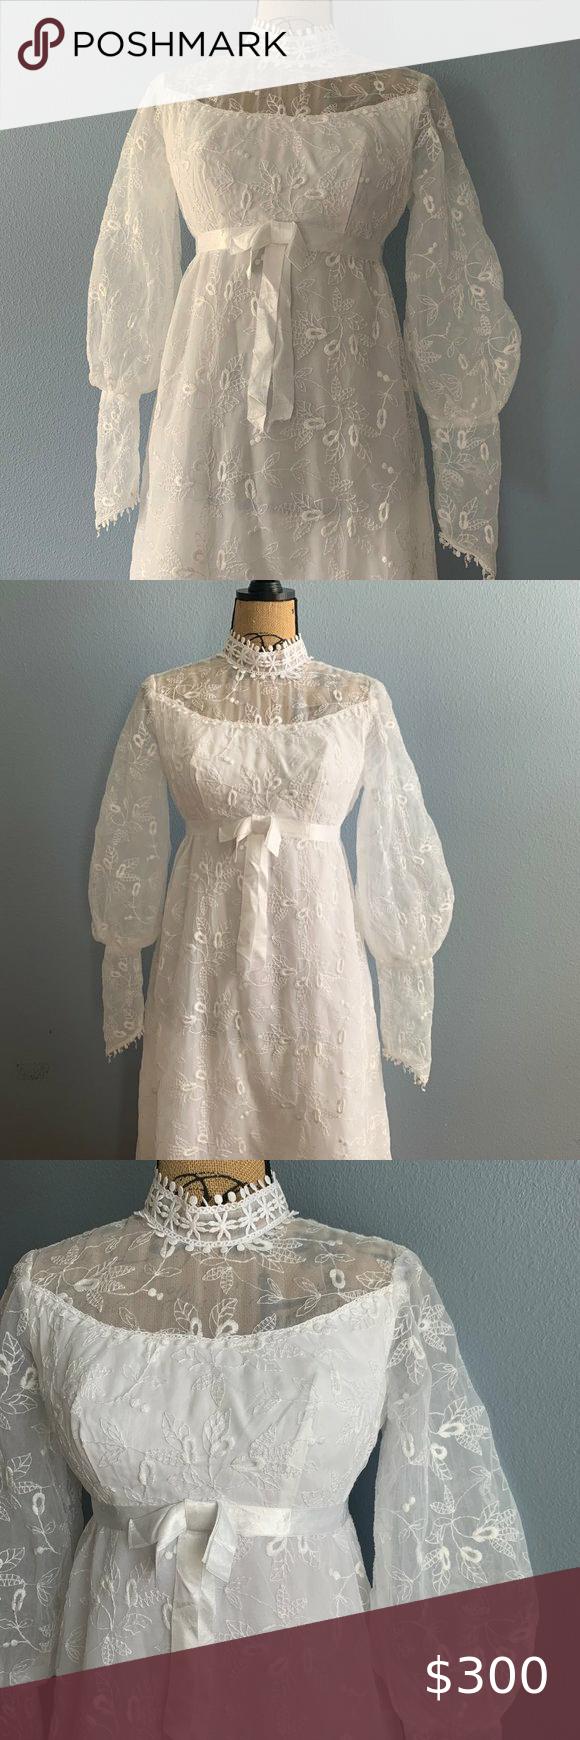 Vintage 70s White Lace Long Sleeve Wedding Dress Vintage 70s White Lace Wedding Dress Vintage Sleeves White Lace Long Sleeve Wedding Dress Blue Lace Midi Dress [ 1740 x 580 Pixel ]